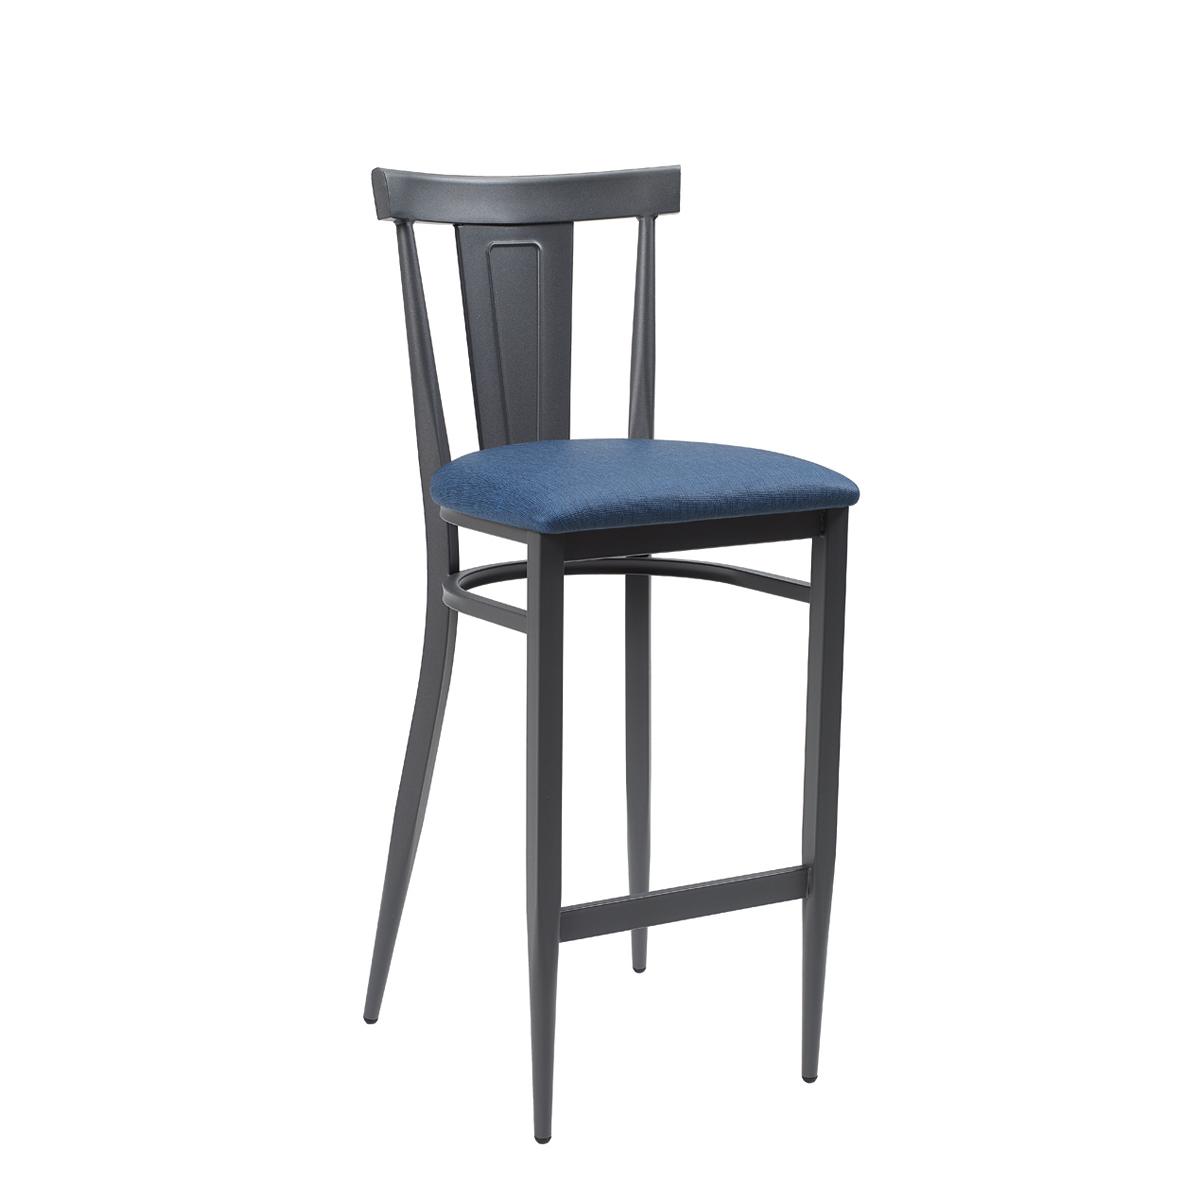 dakota-banqueta-grafito-asiento-tapizado-azul